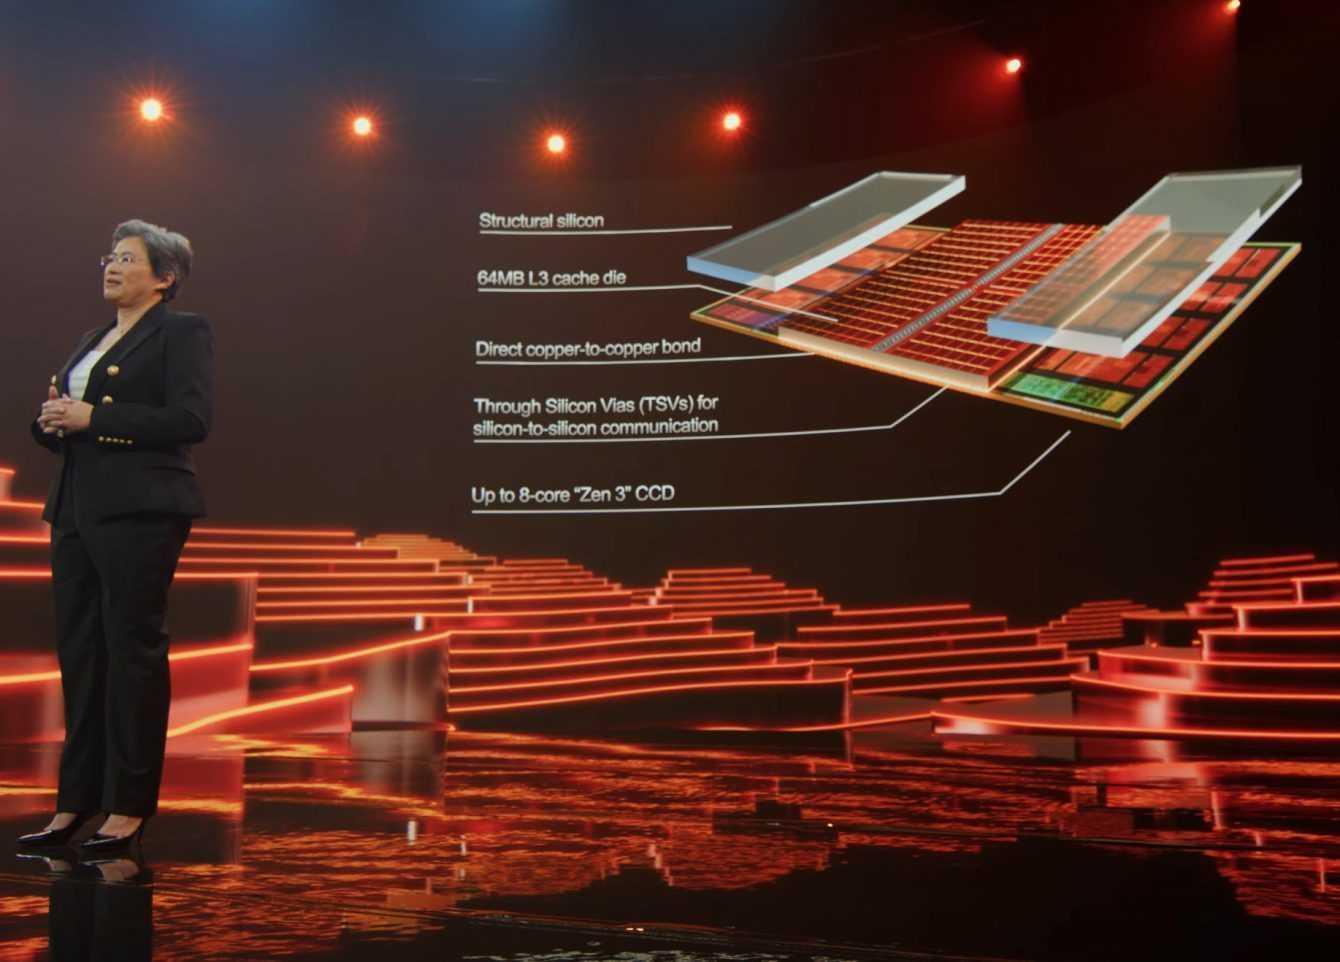 AMD: Ryzen 9 5900X prototype with 3D V-Cache presented